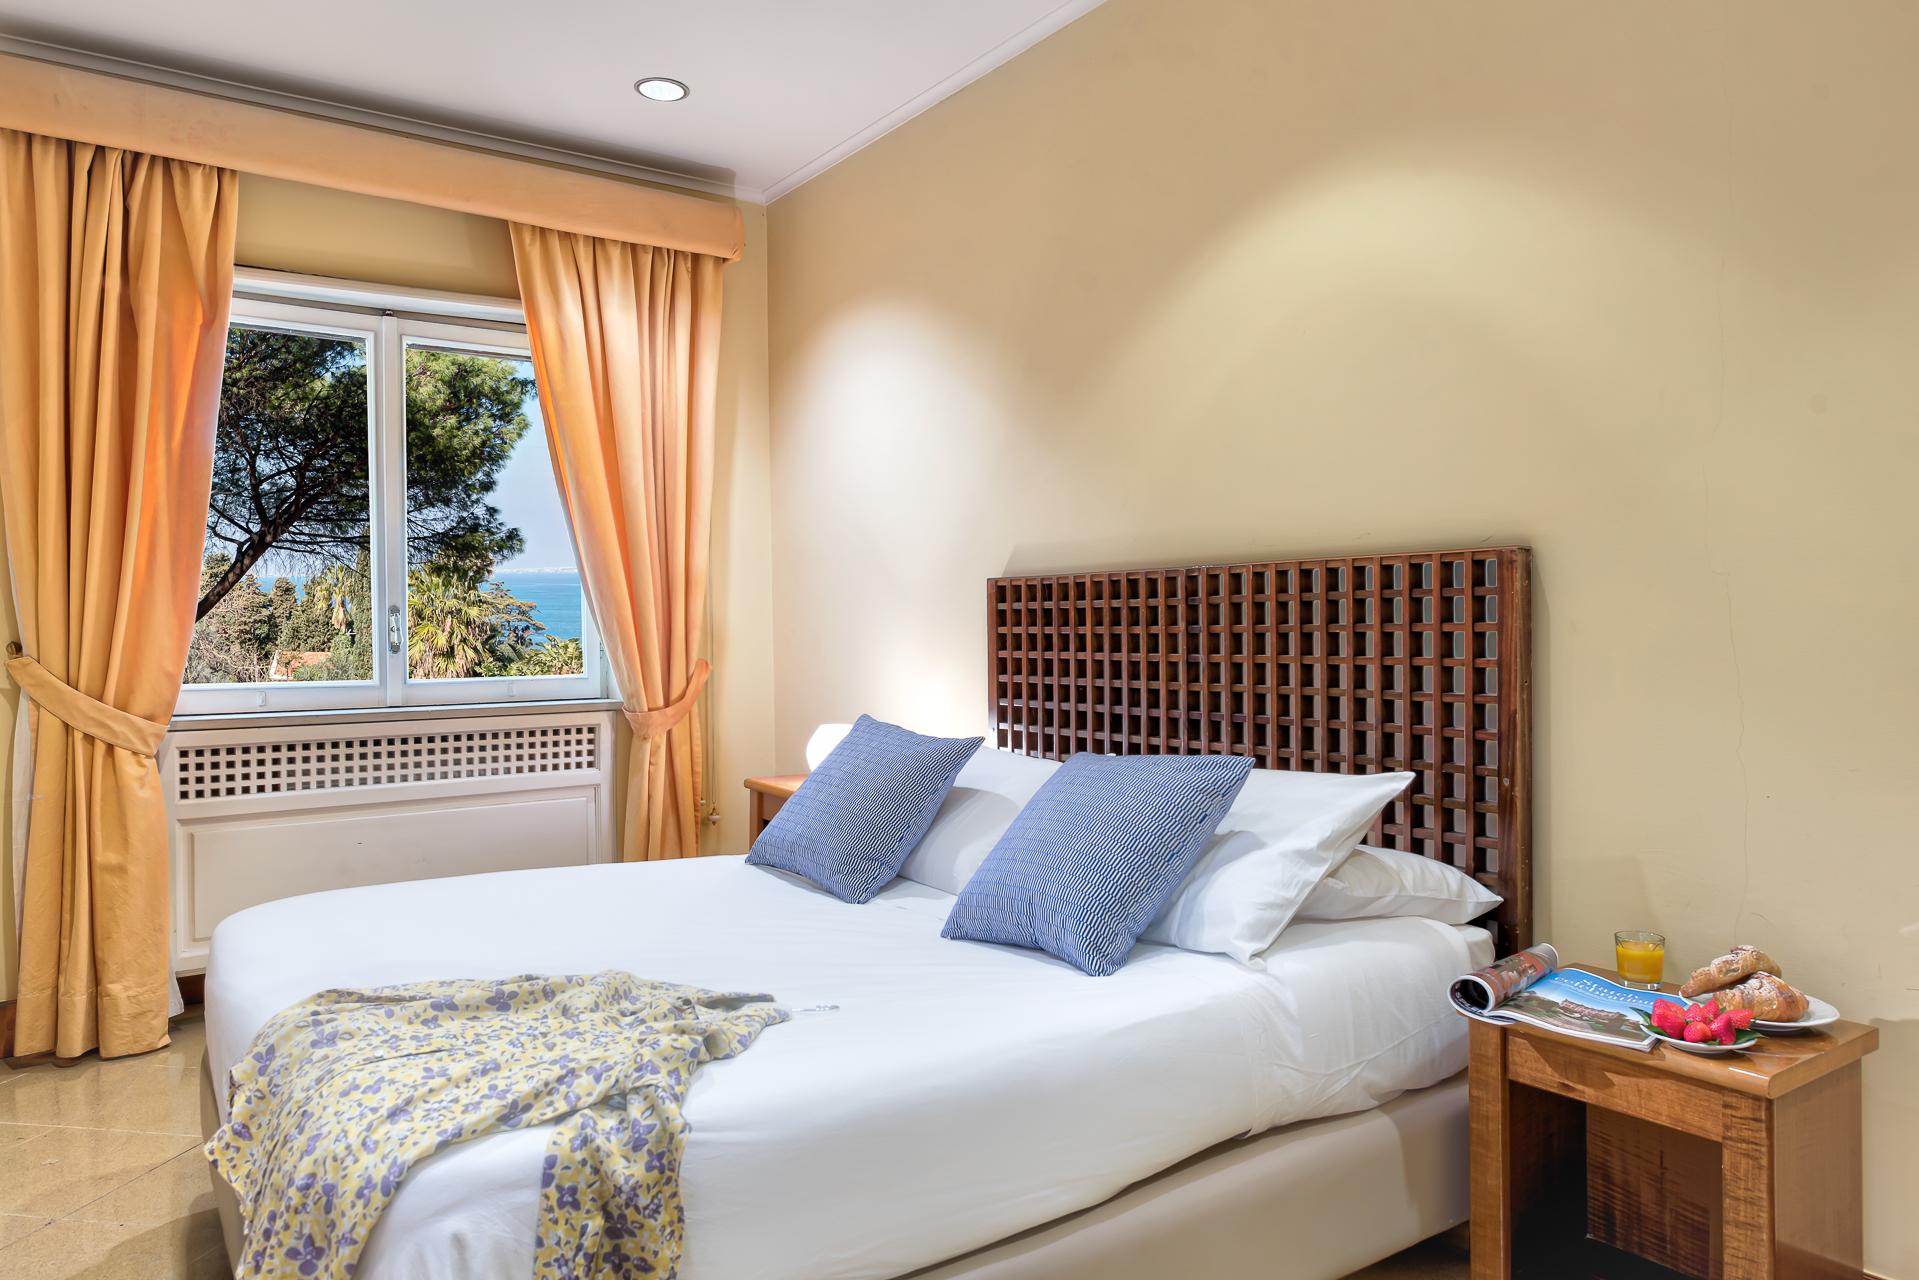 El Royale Suites Sorrento - Gold photo 10498930